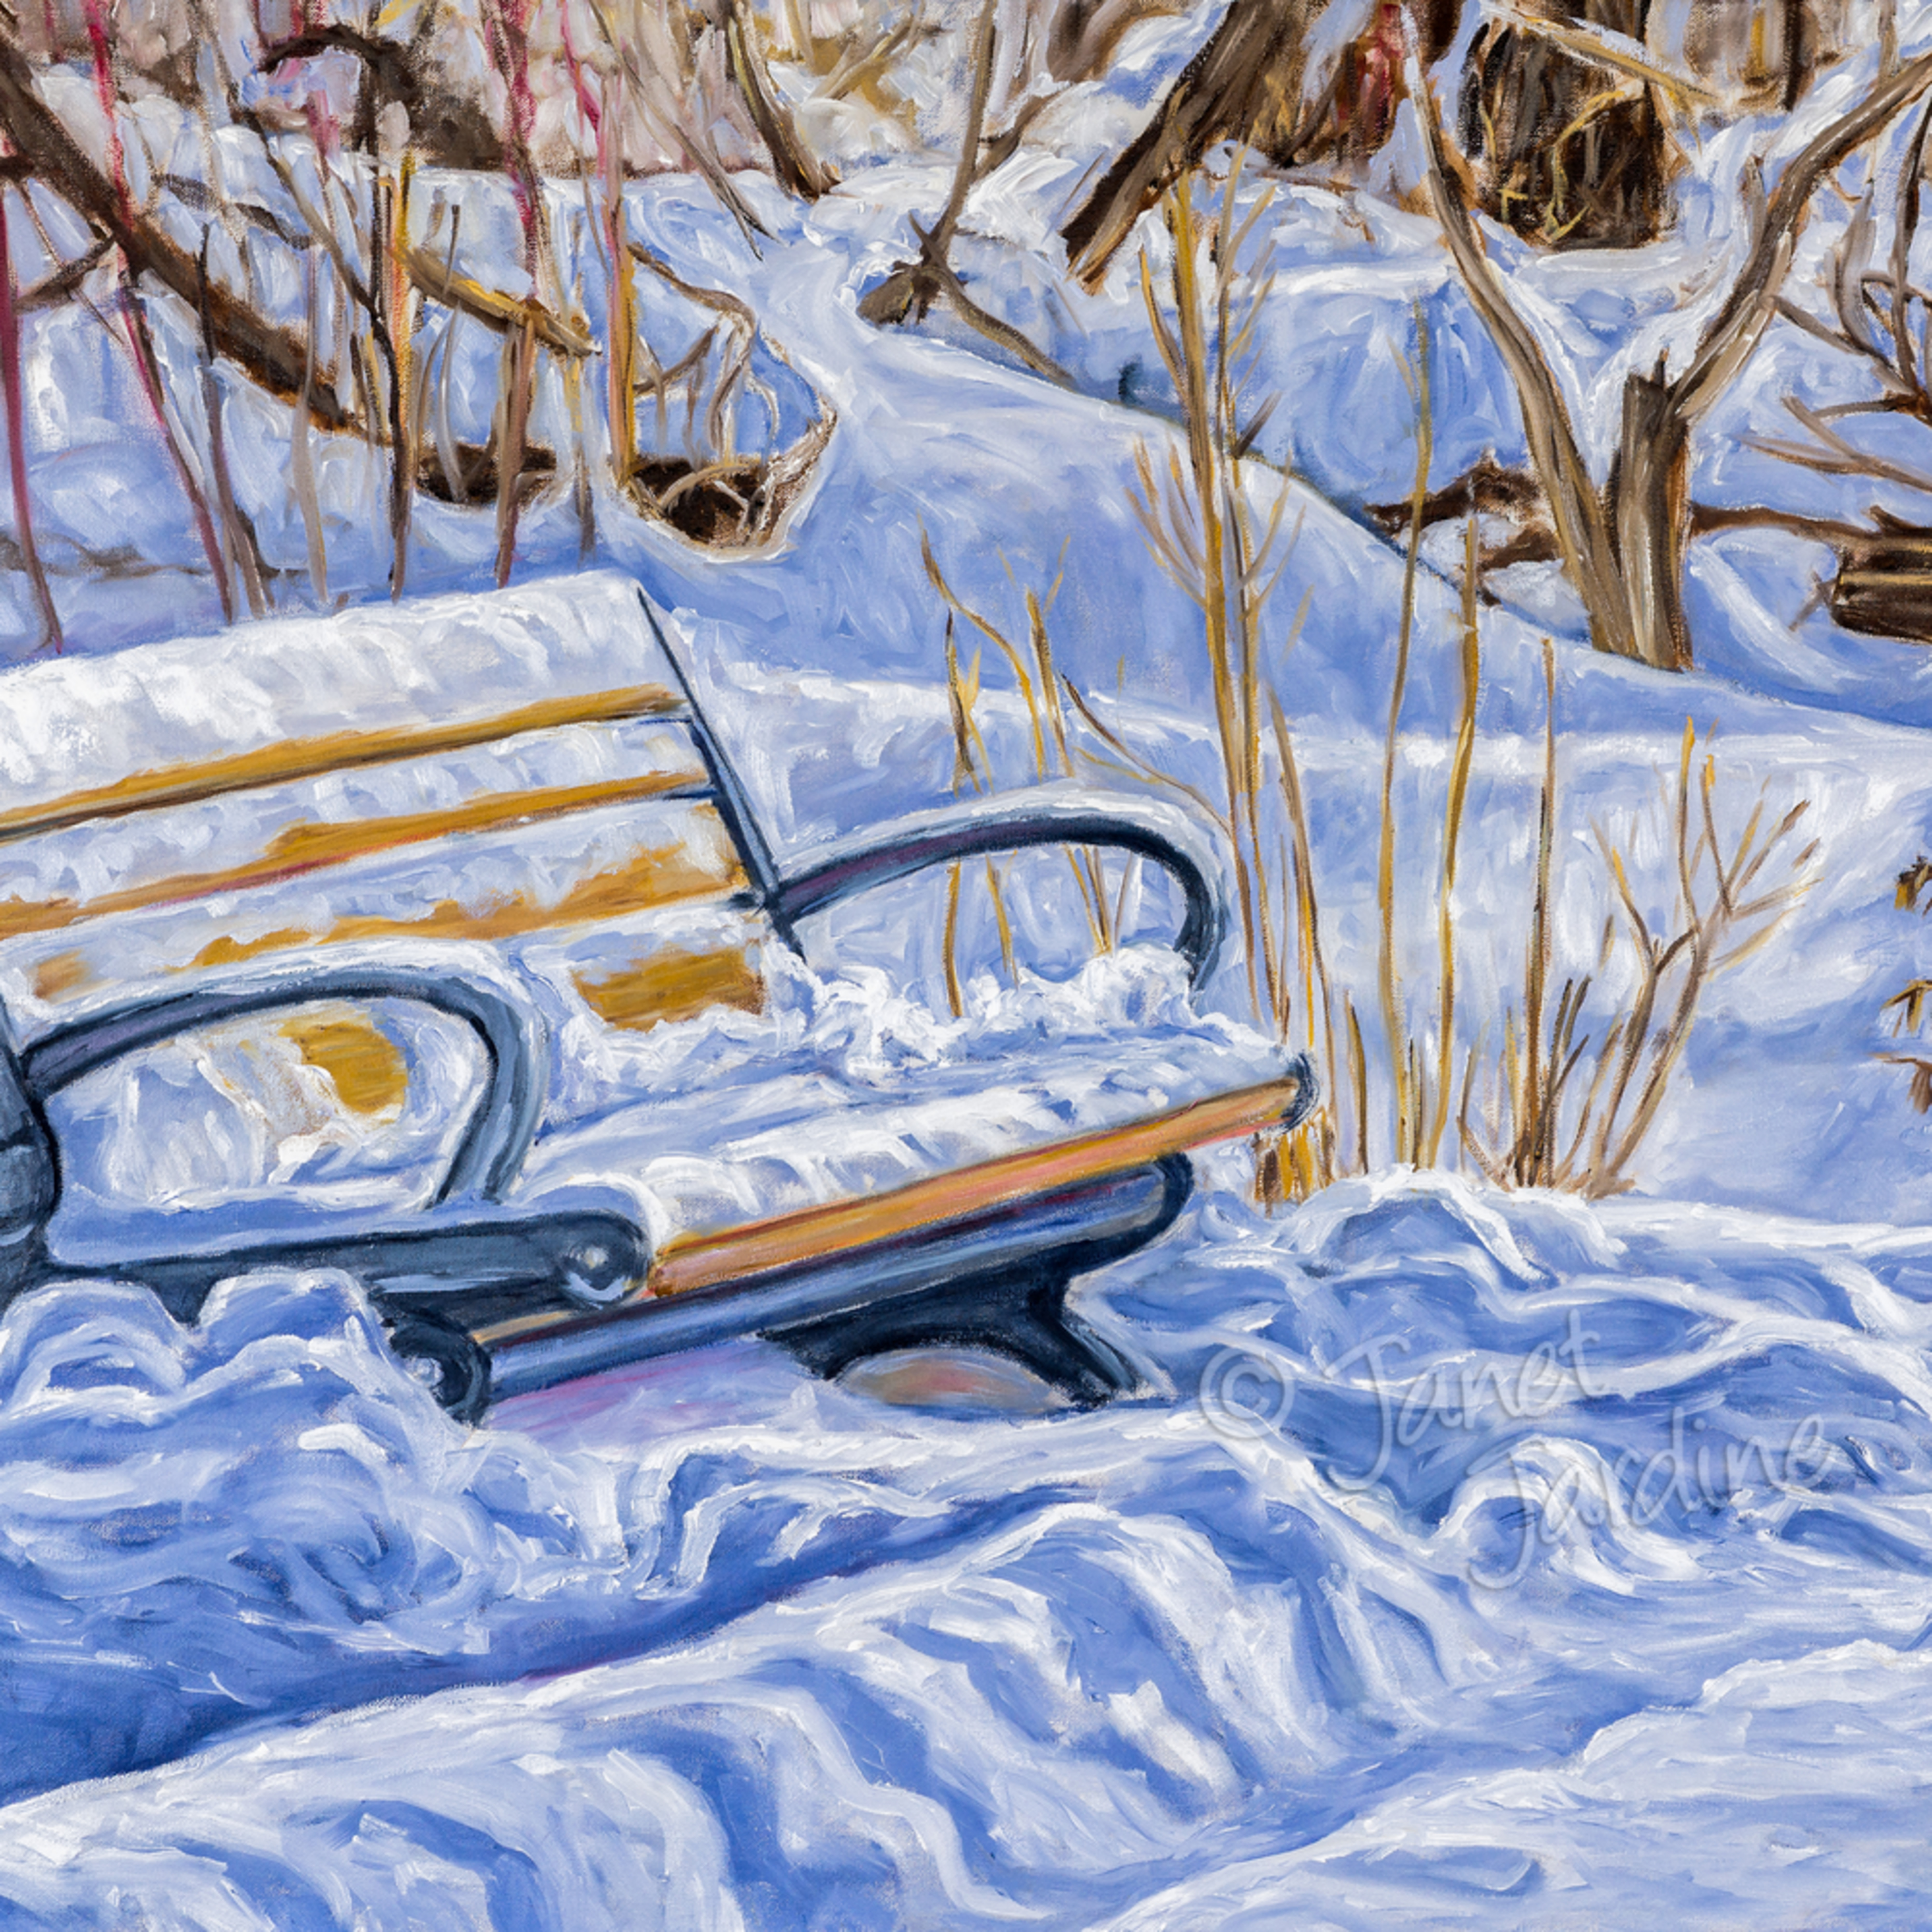 Free parking janet jardine painting zcxiyp